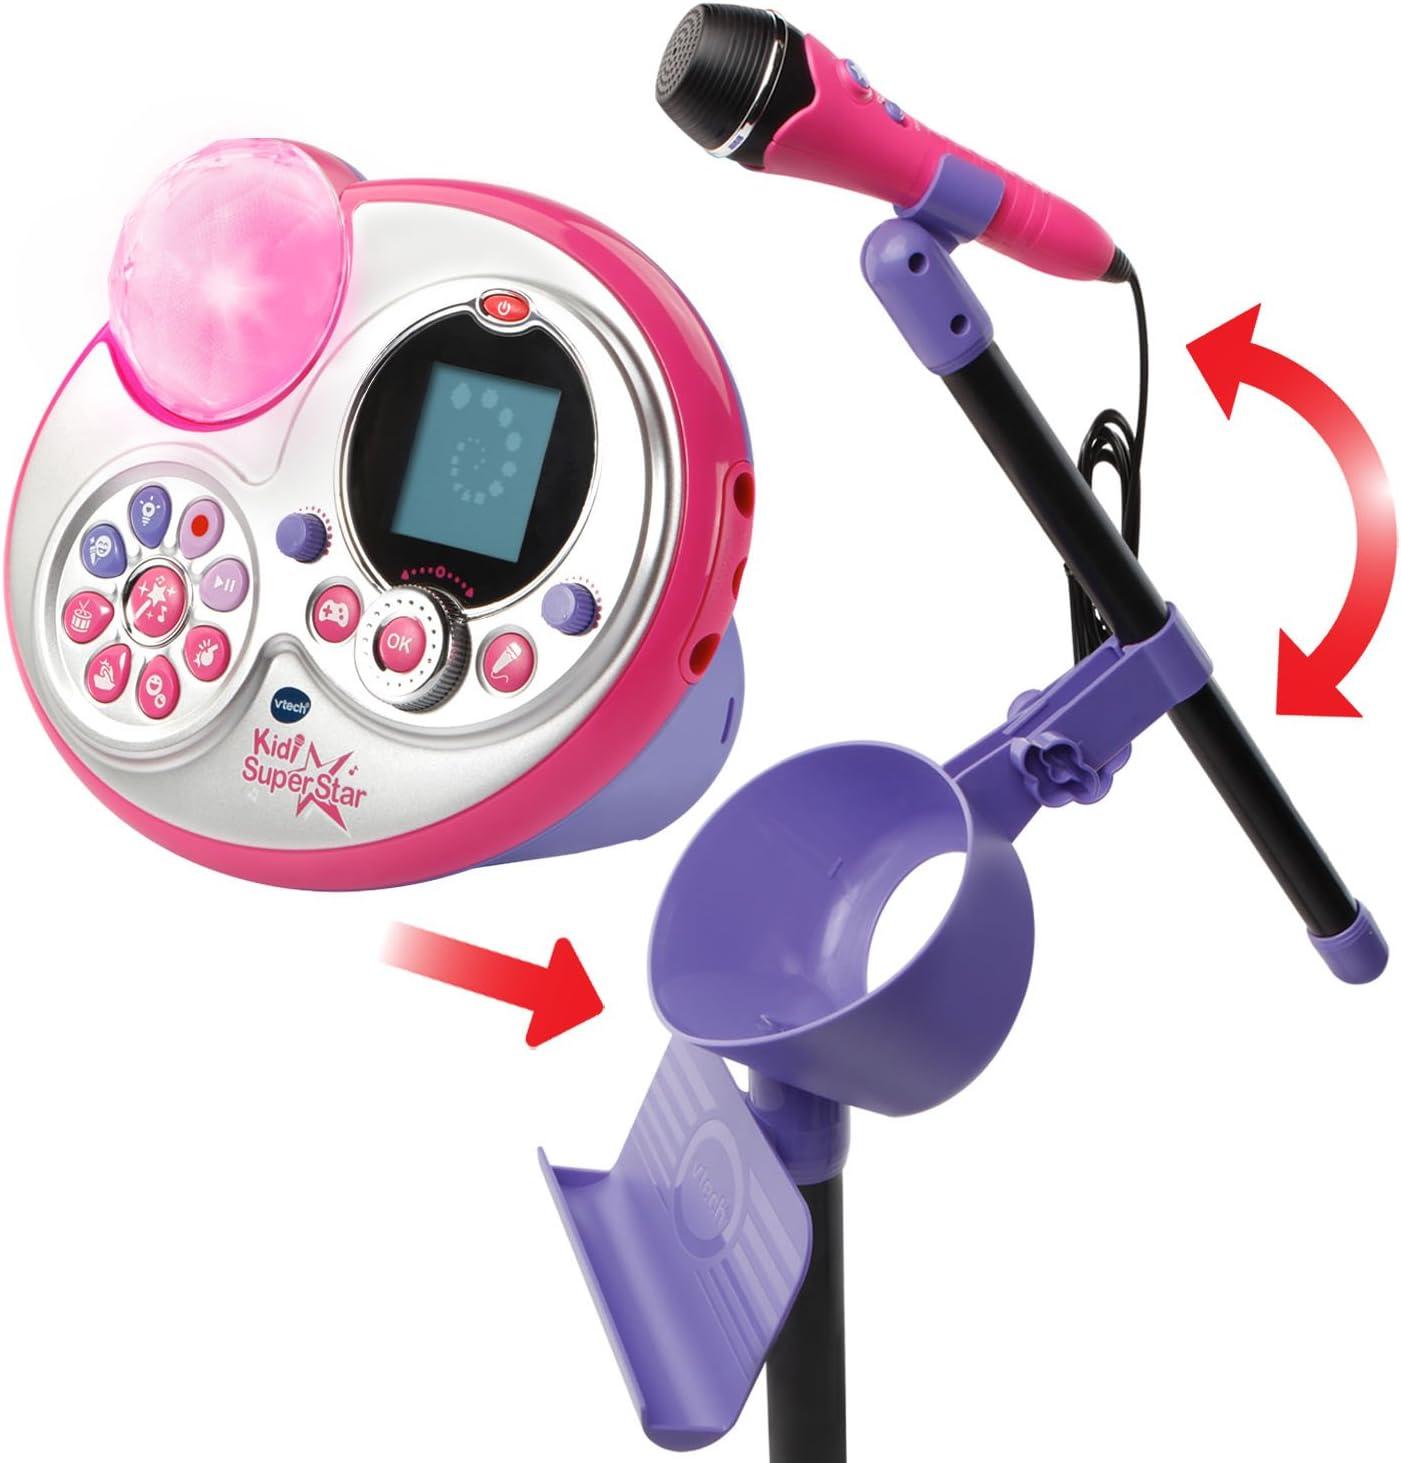 Amazon.com: VTech Kidi Super Star Karaoke System with Mic Stand ...